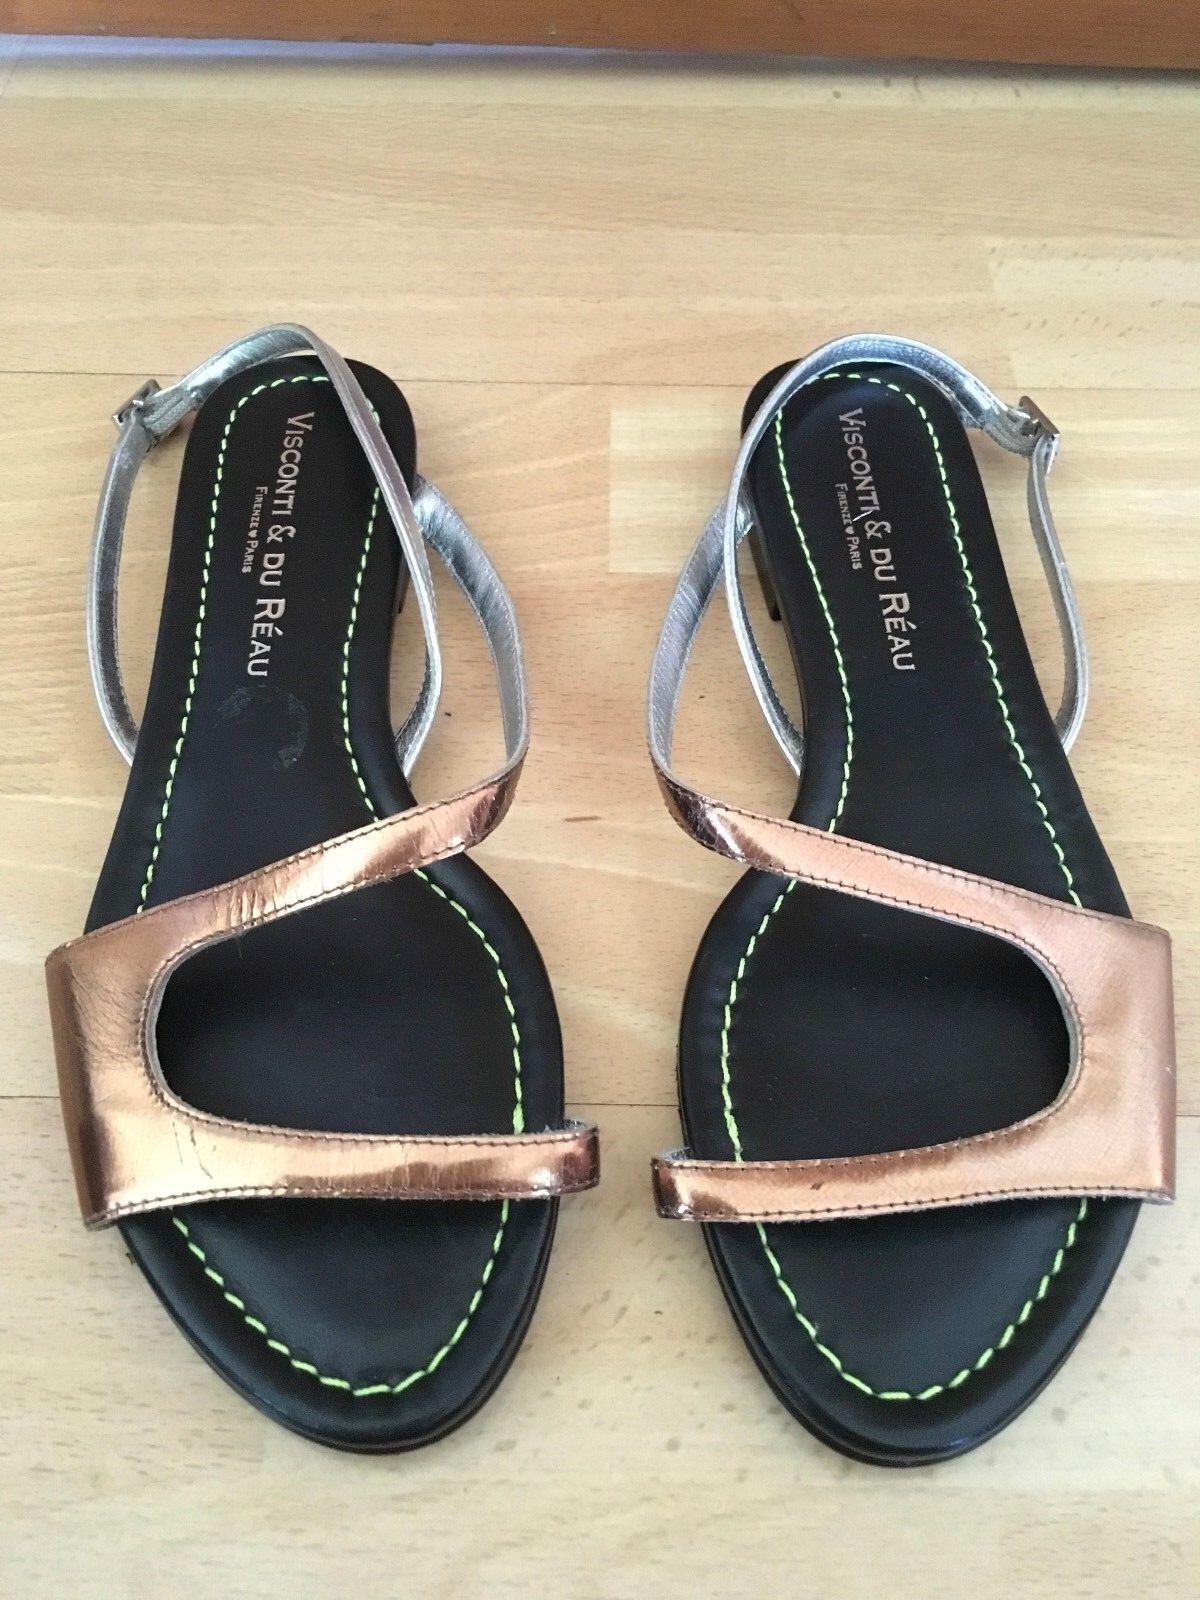 Visconti & Du Réau Copper Silver Gold Strap Flat Sandales Schuhes Größe EU 37 UK 4